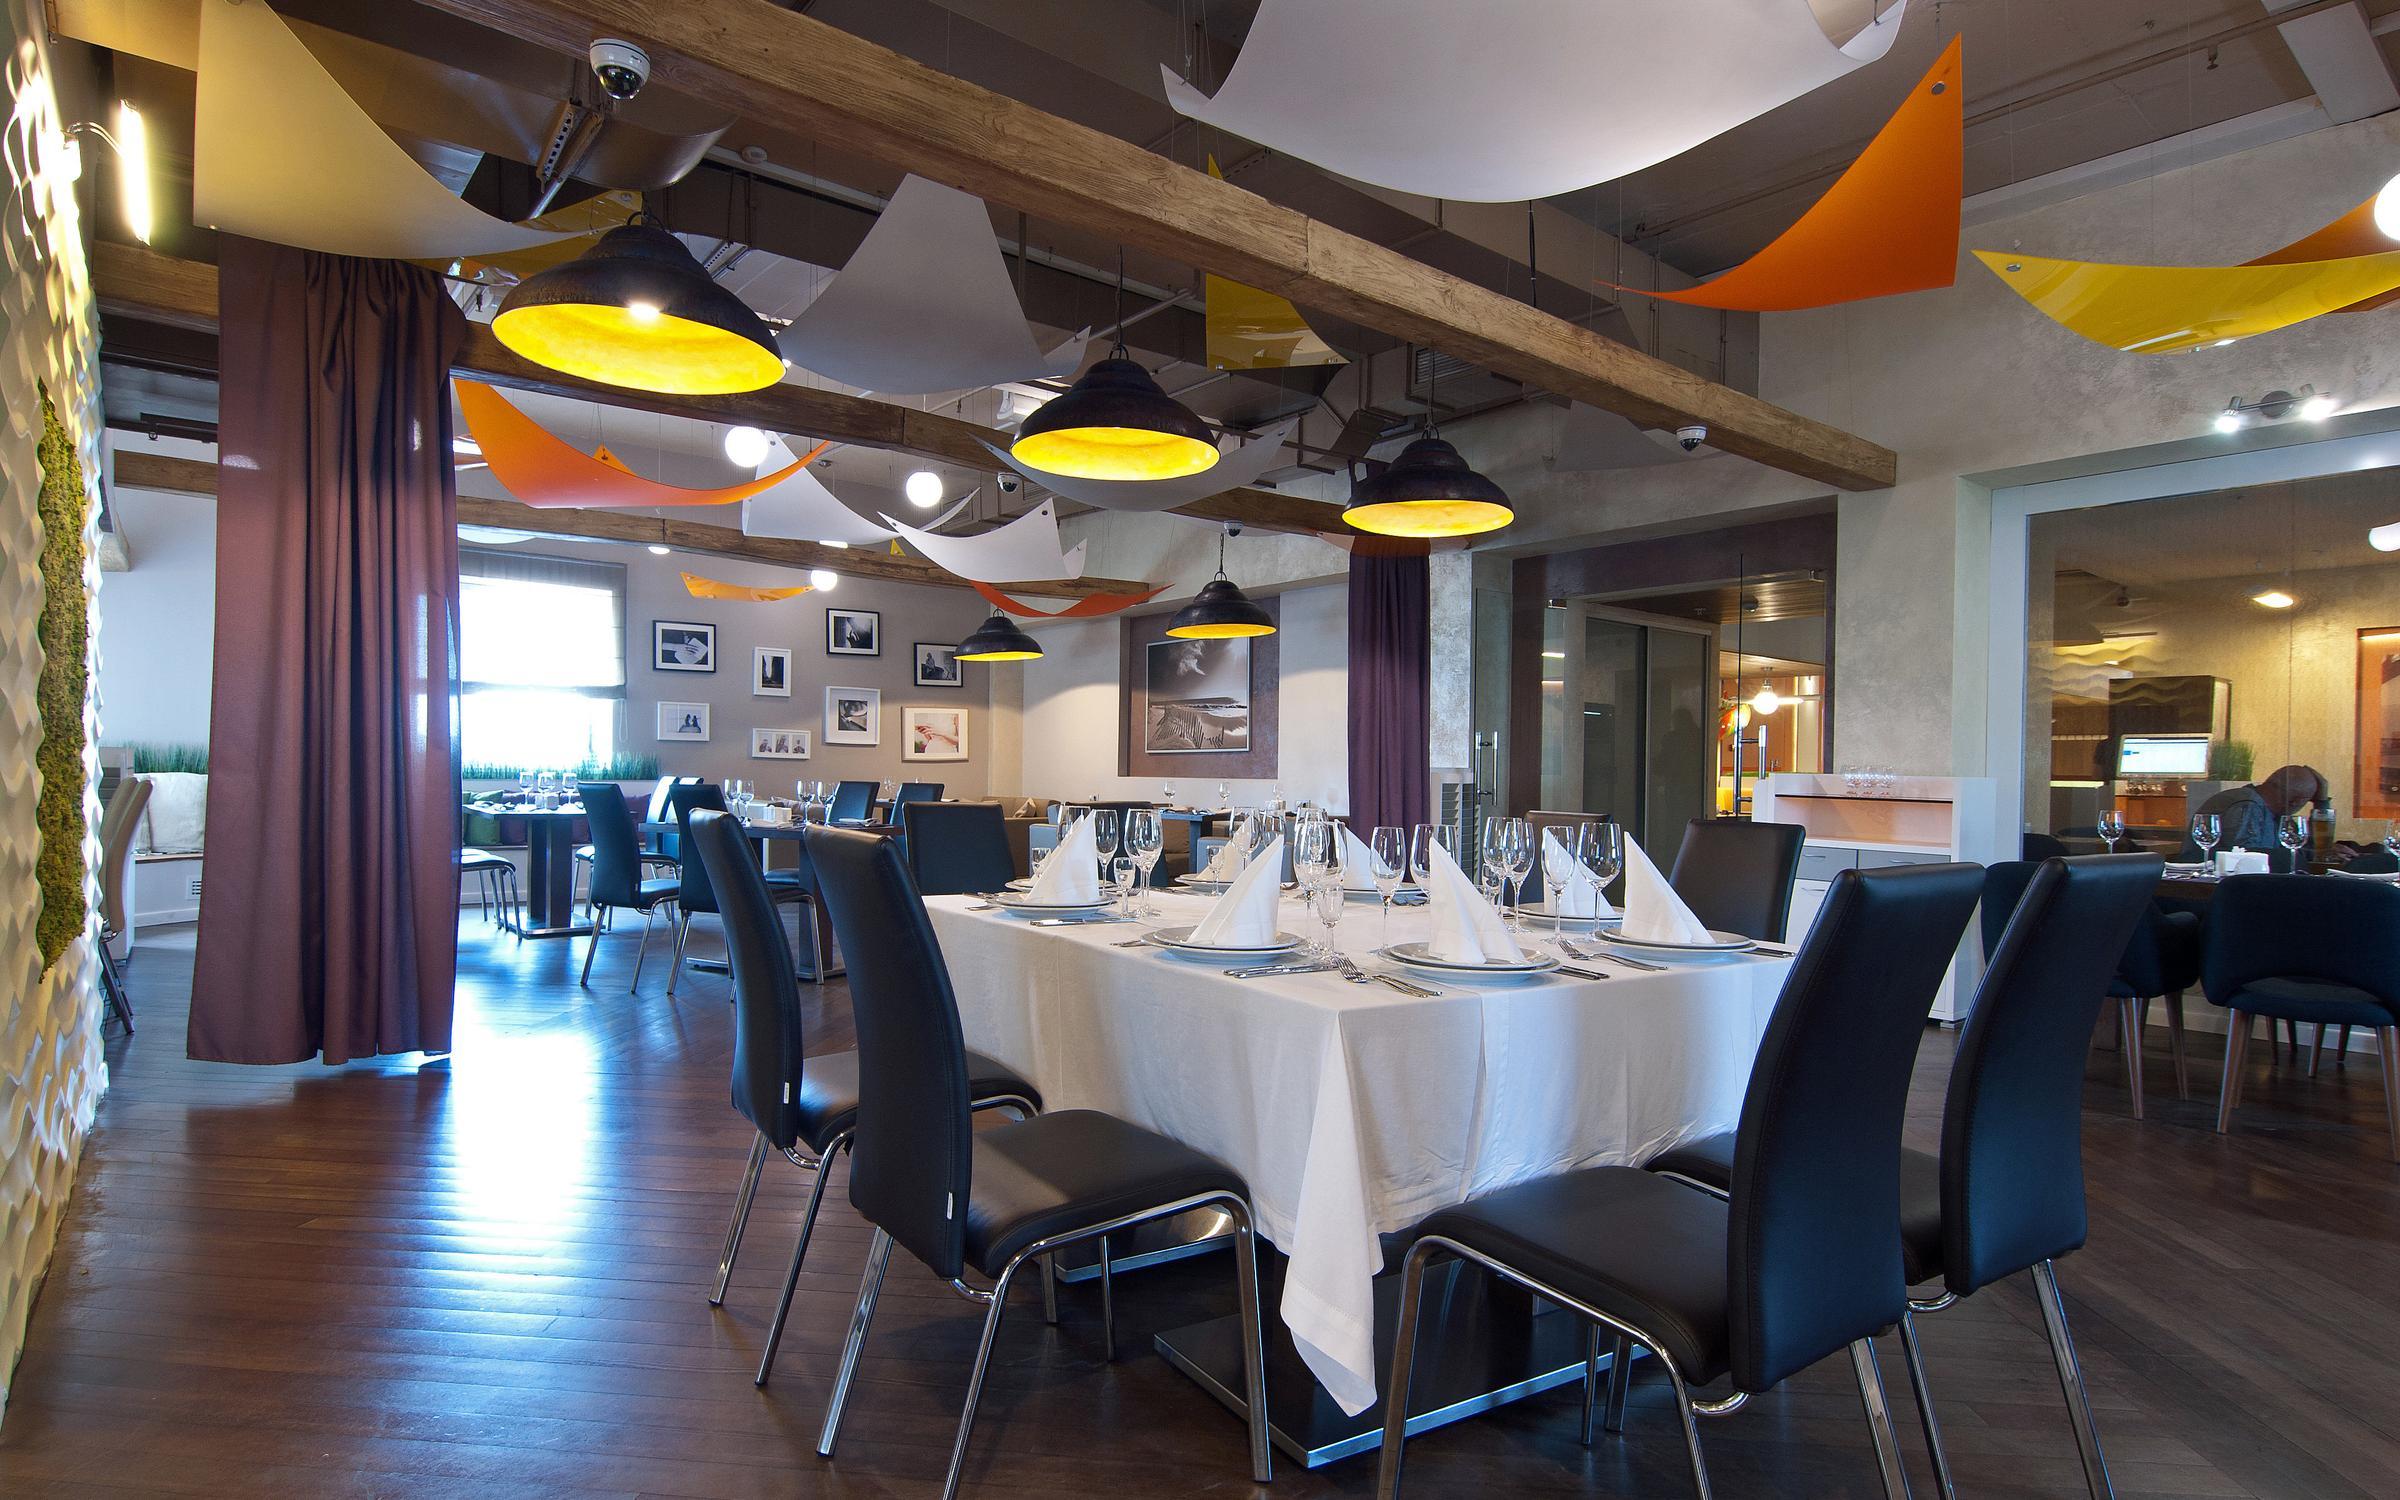 фотография Ресторана Light Touch в отеле Митино